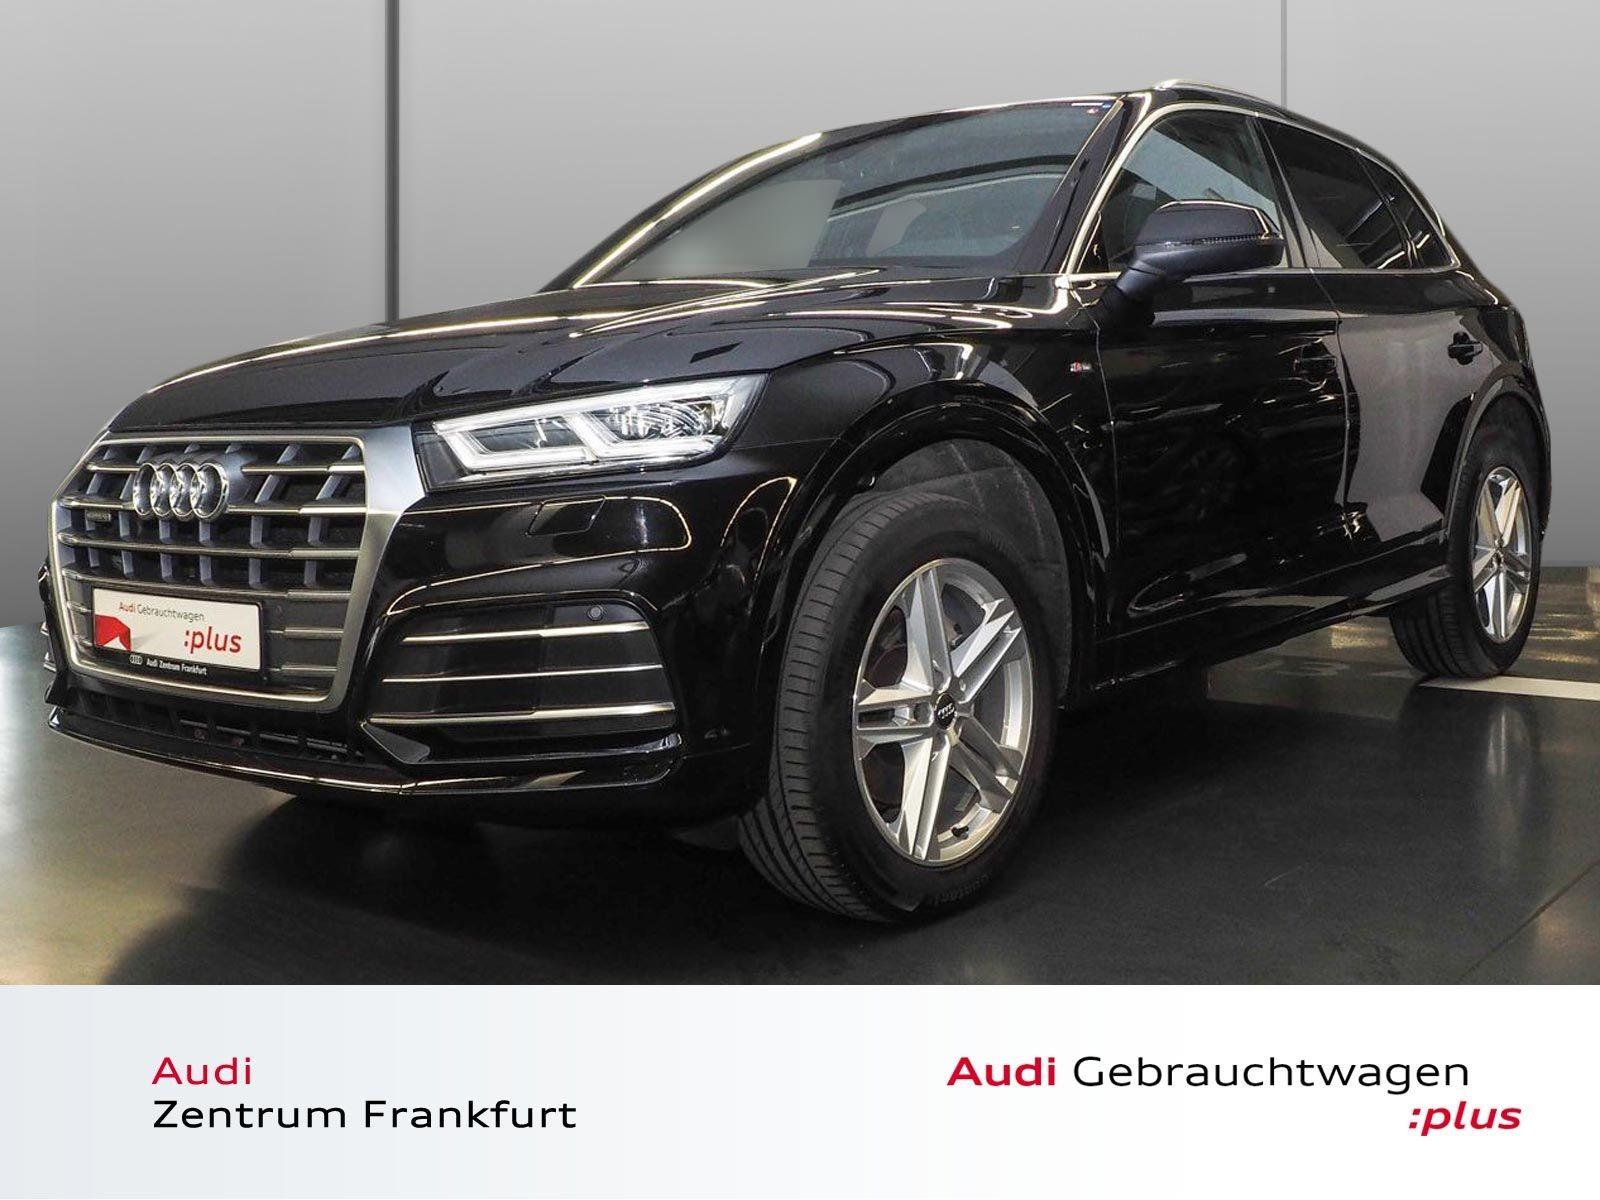 Audi Q5 40 TDI Sport quattro S tronic S line AHK Navi LED PDC Tempomat, Jahr 2019, Diesel